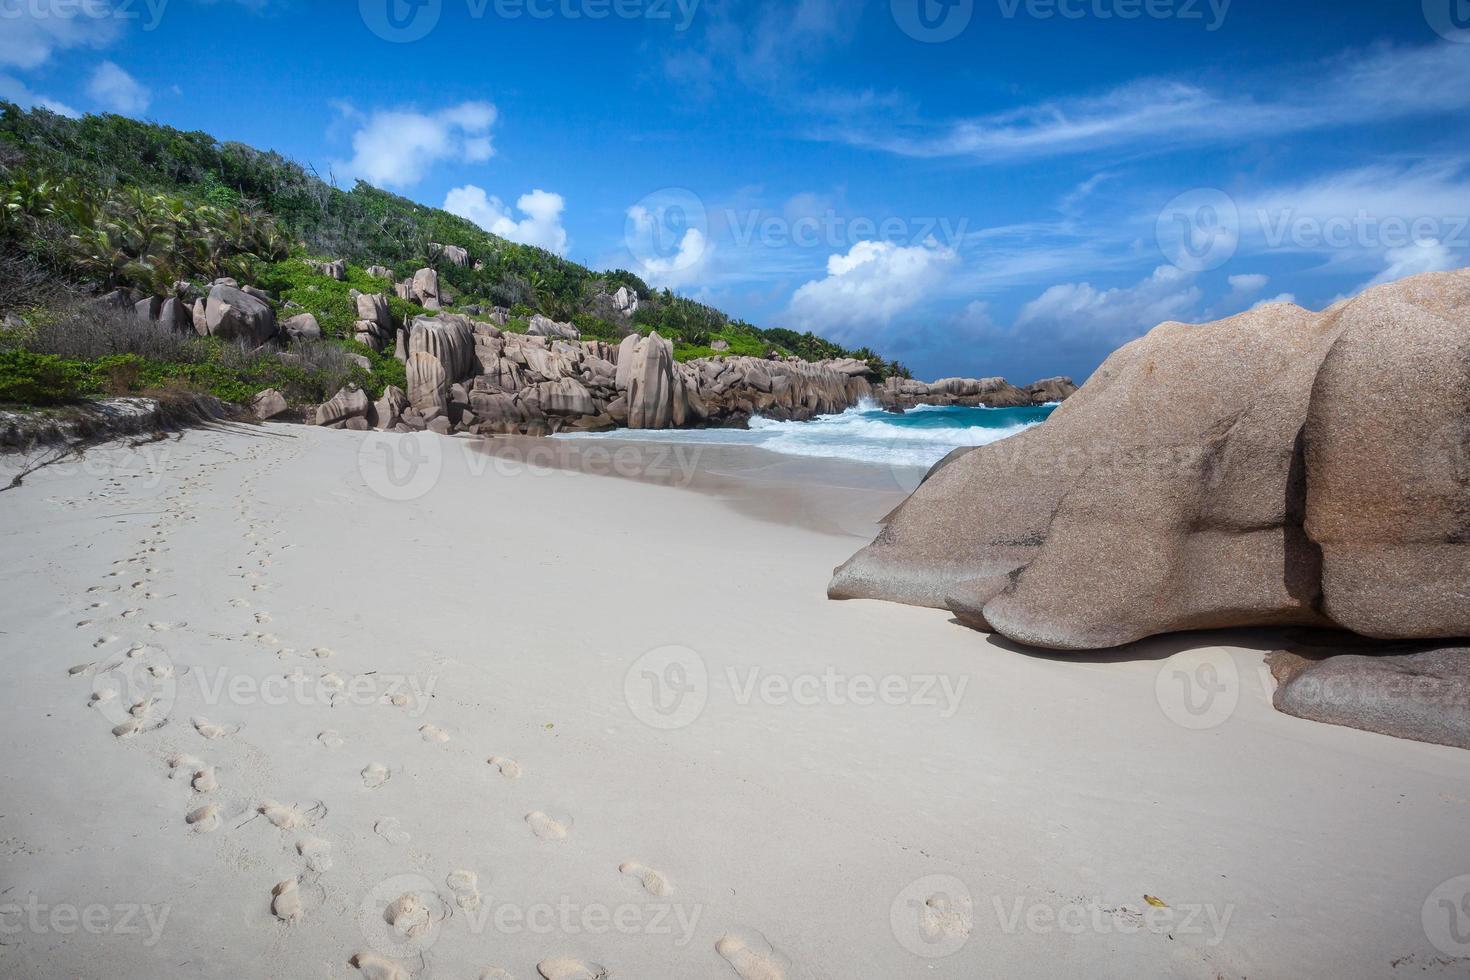 fotavtryck i sanden på en ensam strand foto